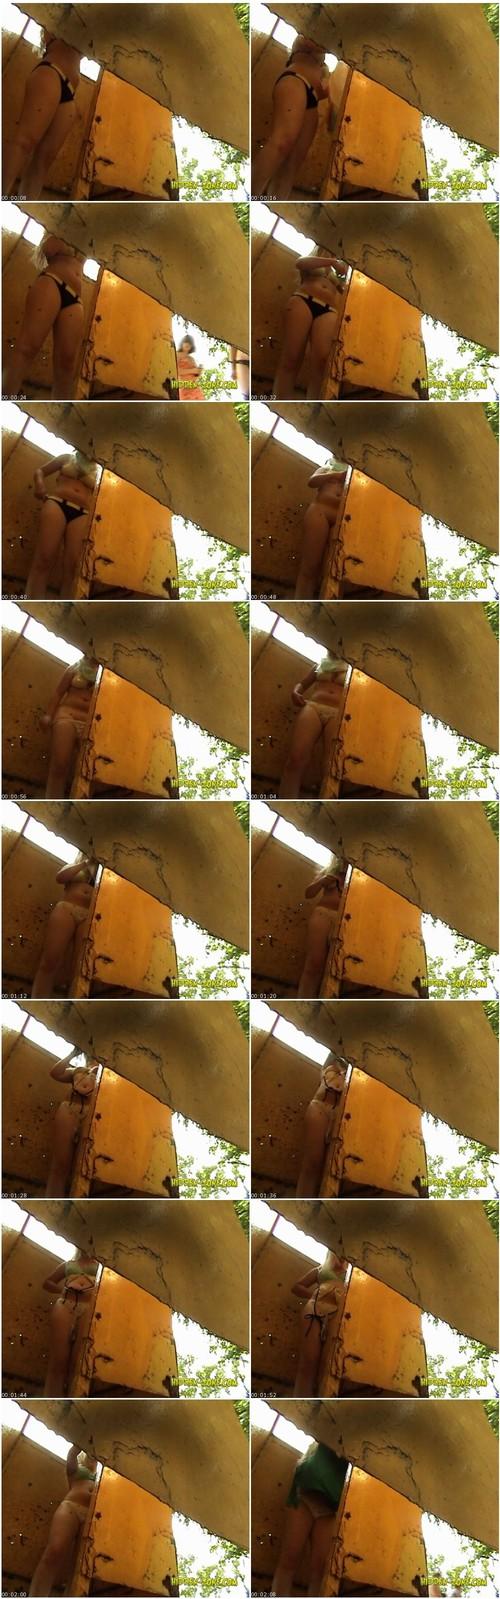 http://ist5-1.filesor.com/pimpandhost.com/9/6/8/3/96838/6/i/t/f/6itf3/Hidden-zoneBeach346_thumb_m.jpg